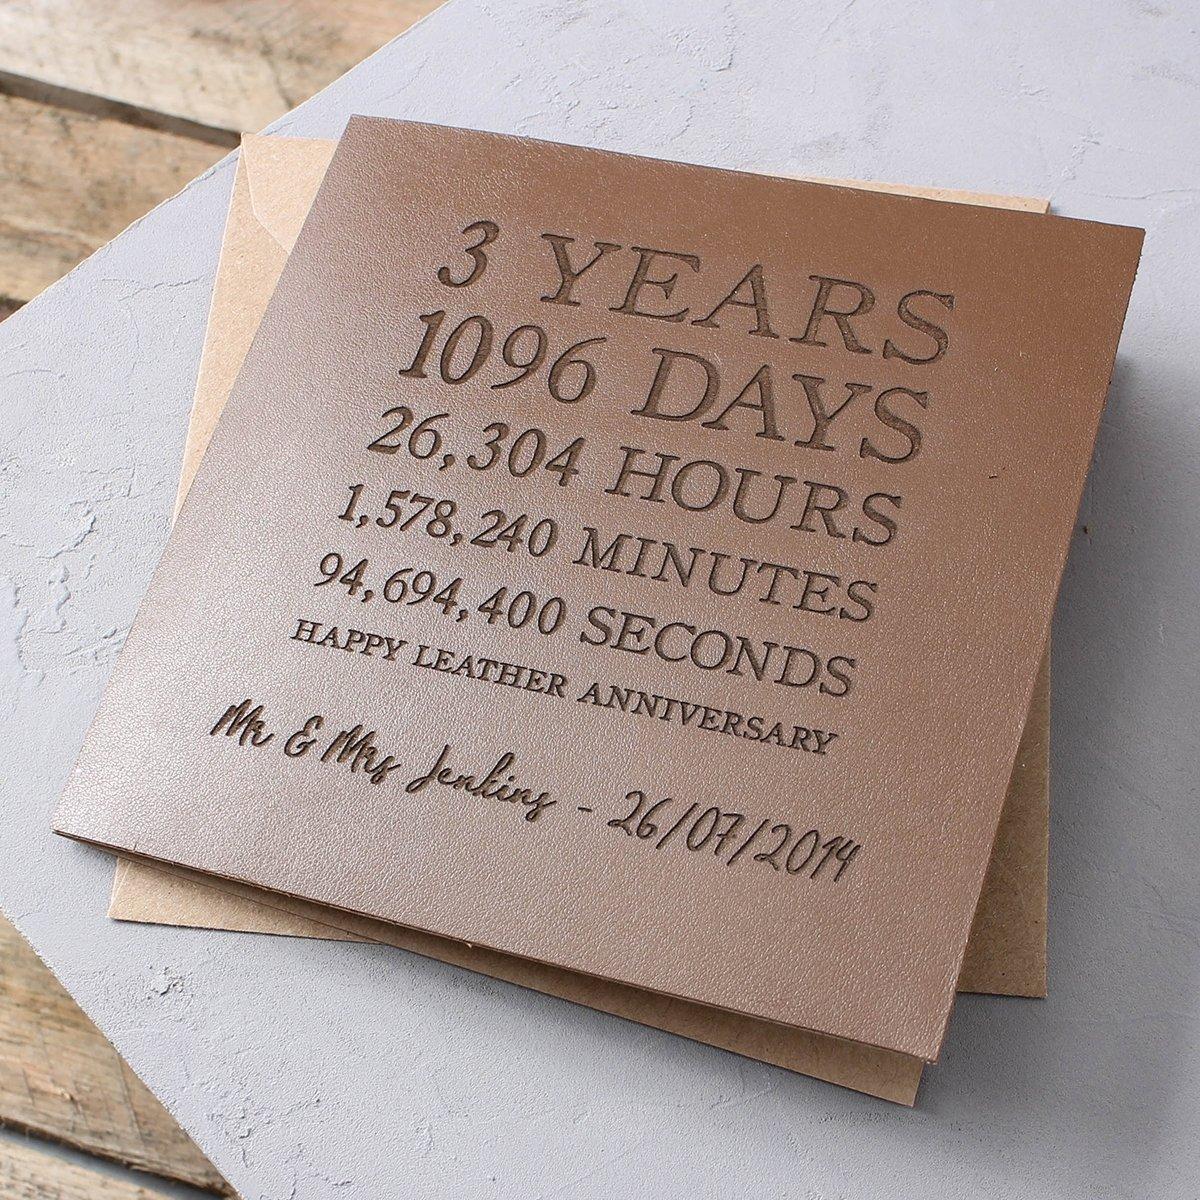 10 Most Popular 3Rd Wedding Anniversary Gift Ideas third anniversary gifts for him wedding anniversary gift ideas 2020